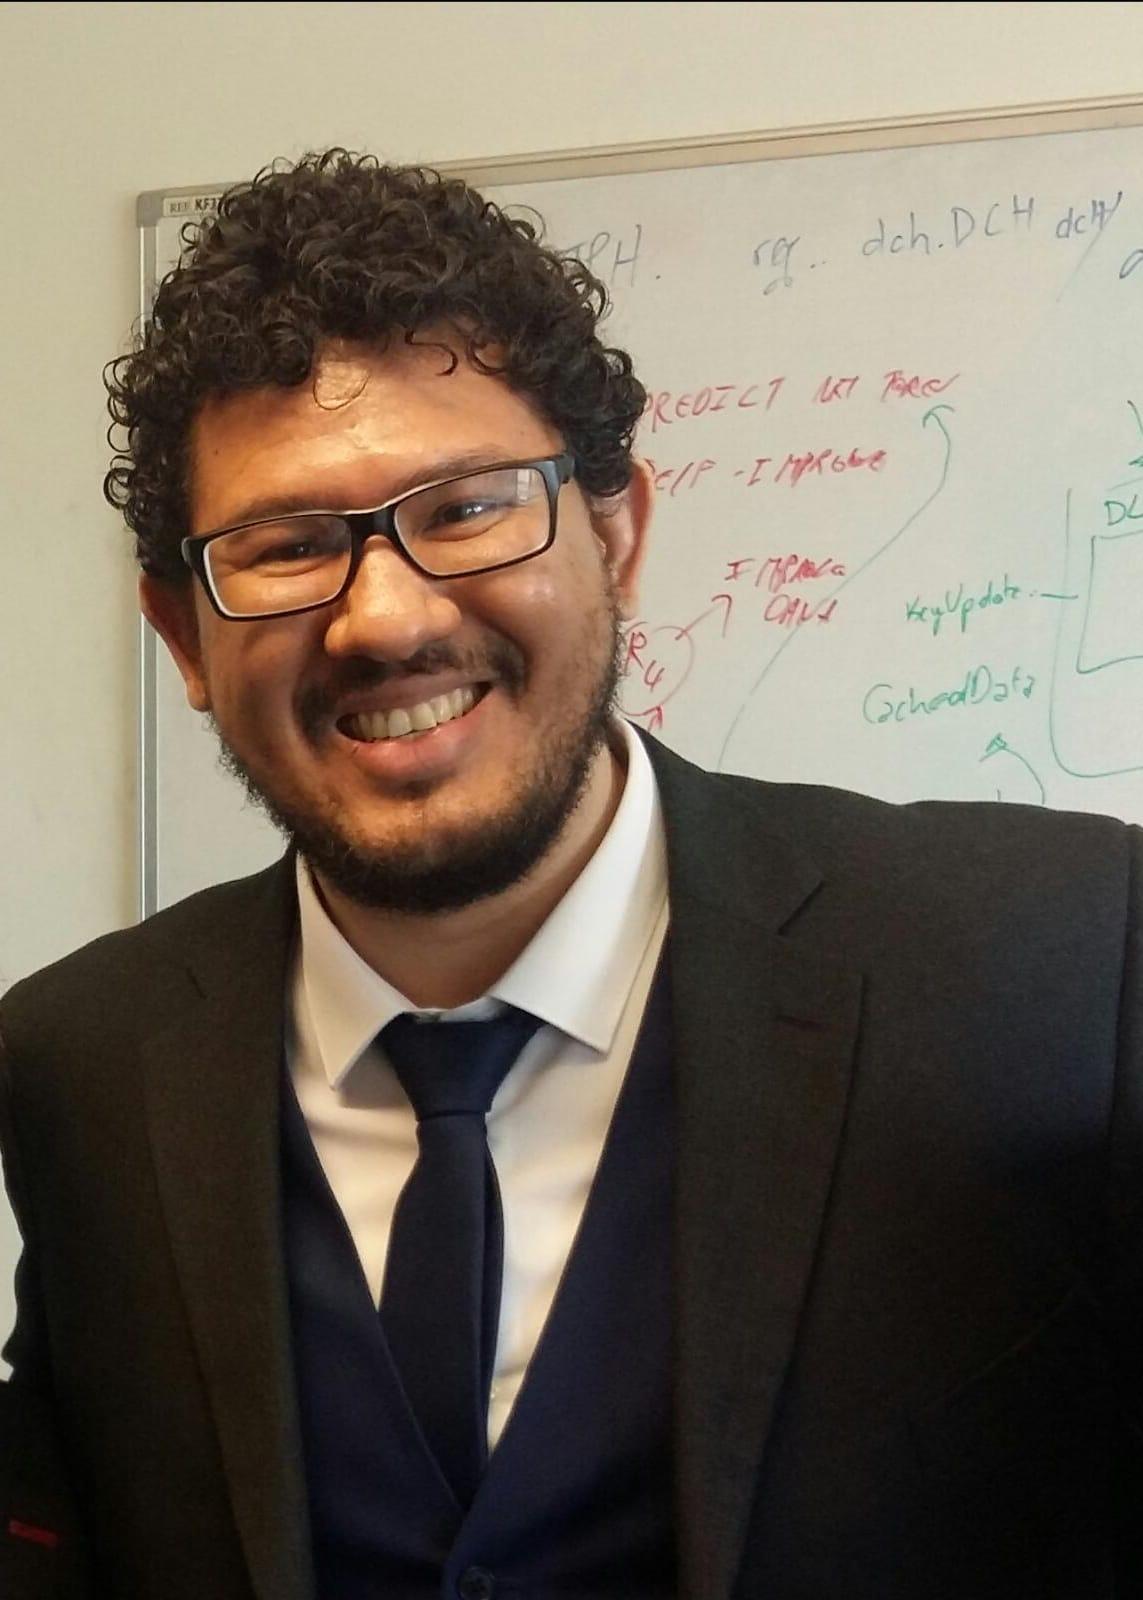 Roberto Rodrigues Filho